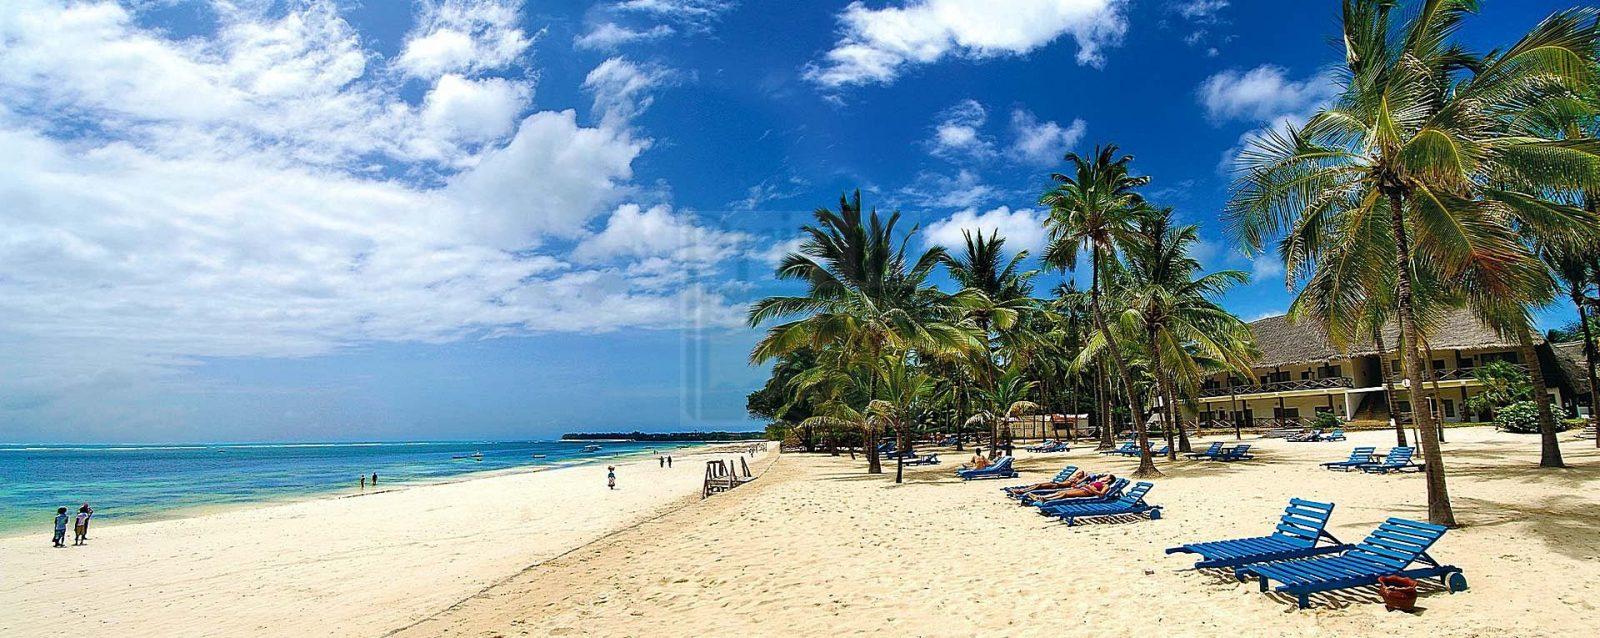 5 Days Luxury Malindi Beach Holiday Safari Kenya Tour